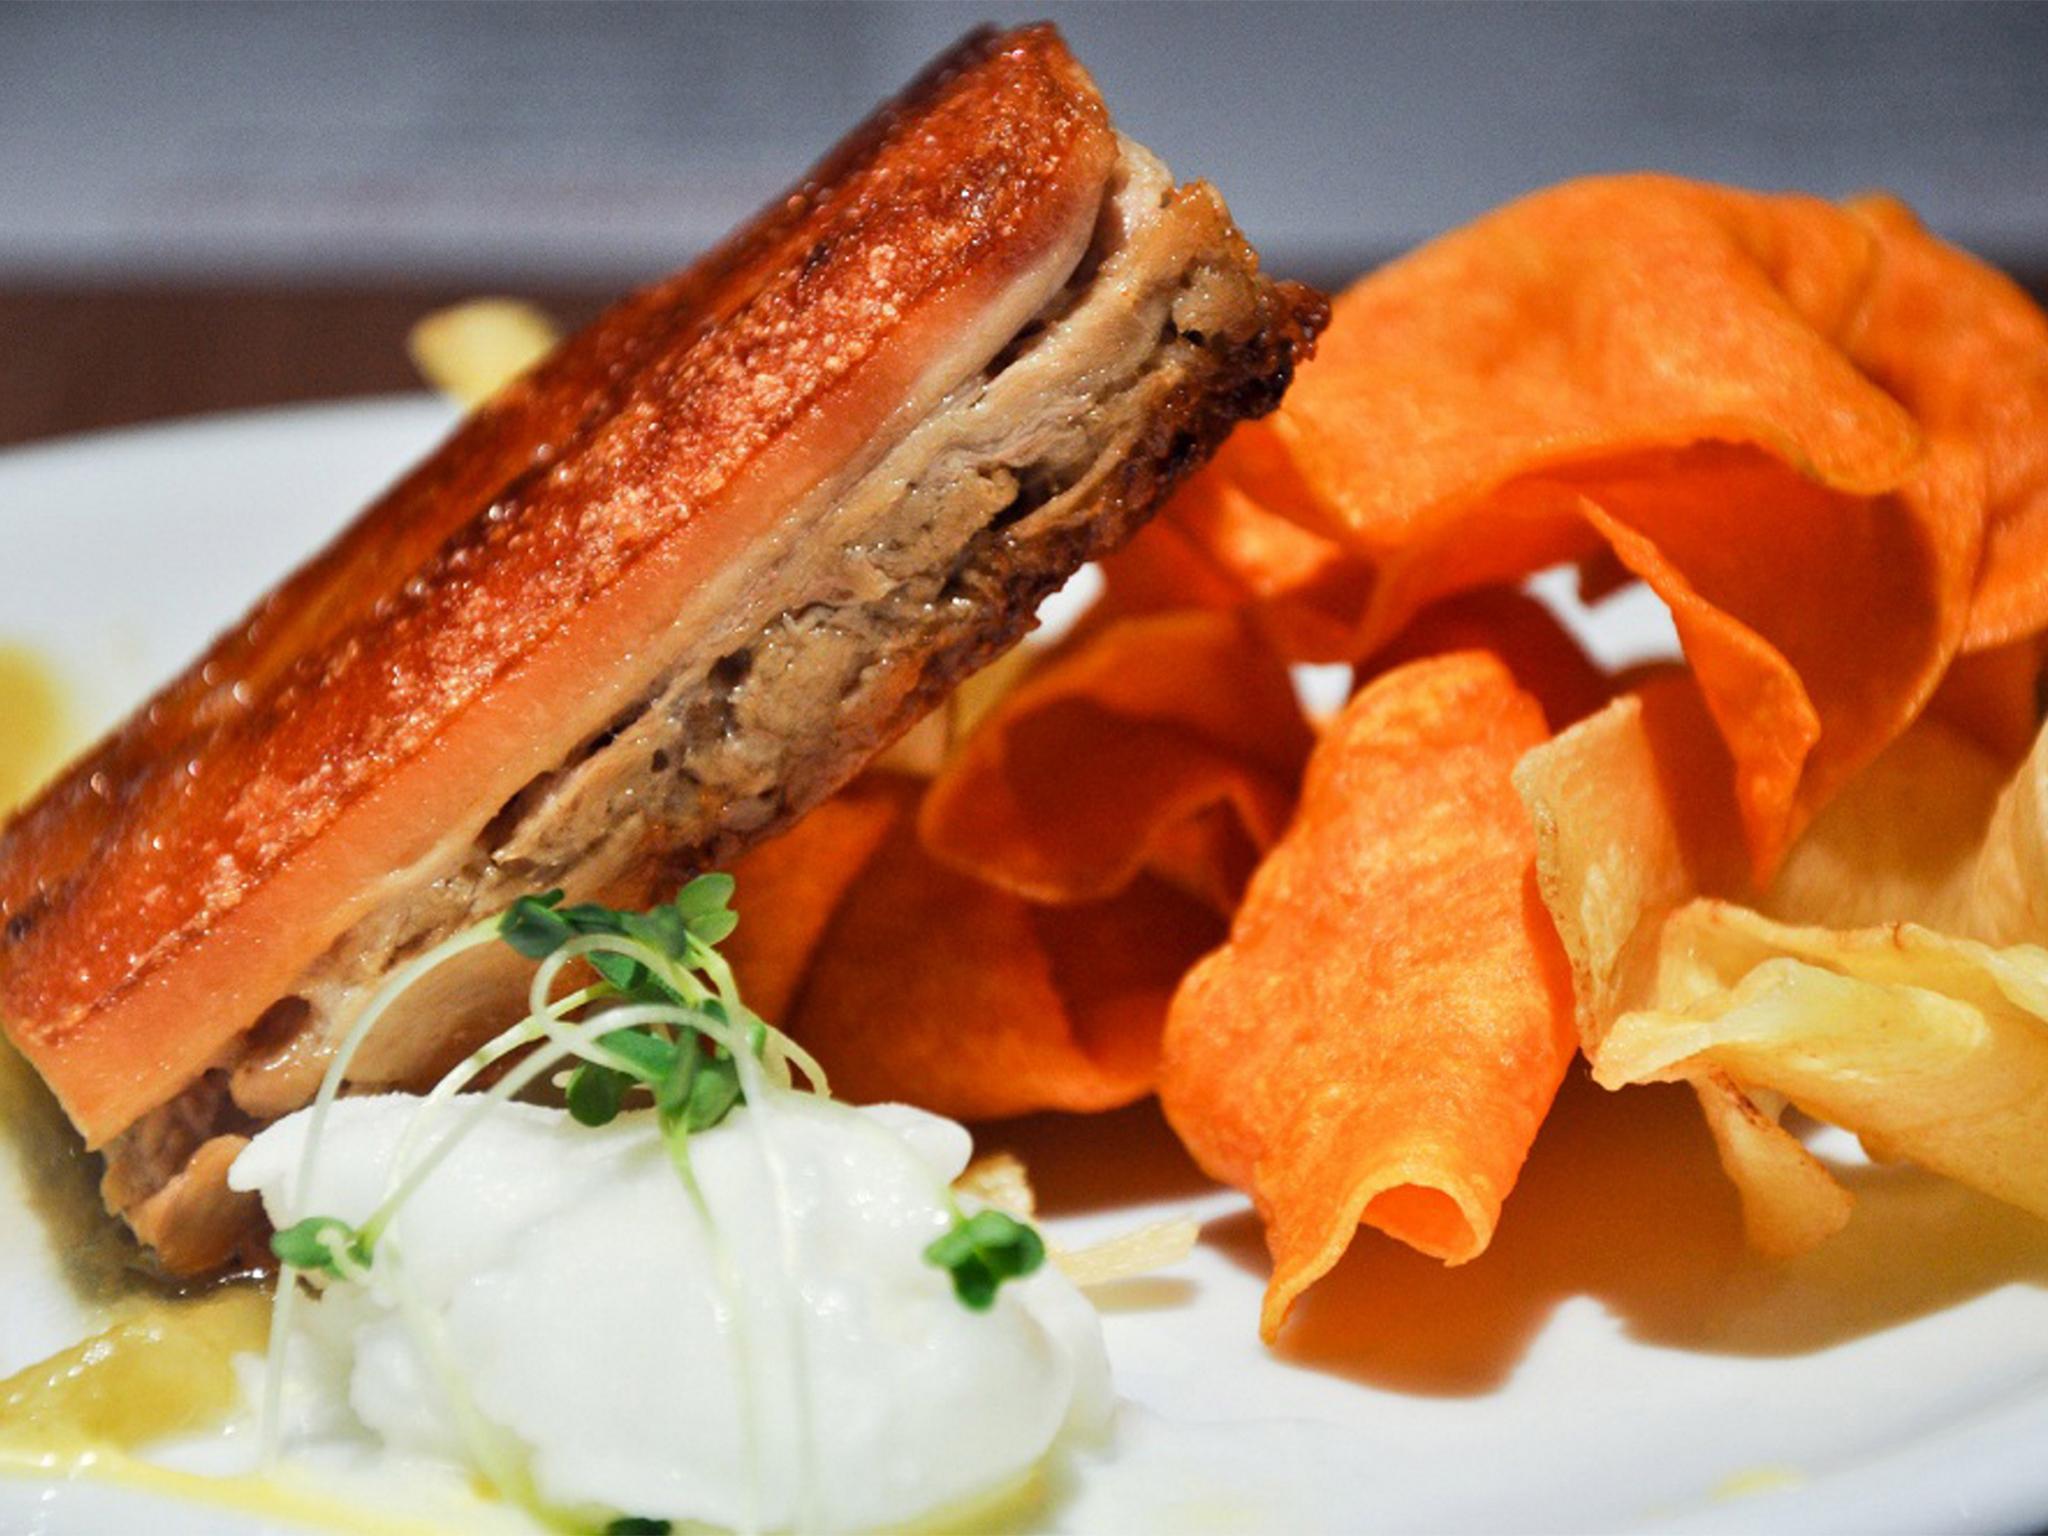 100 best restaurants in London 2015 - Boqueria Tapas